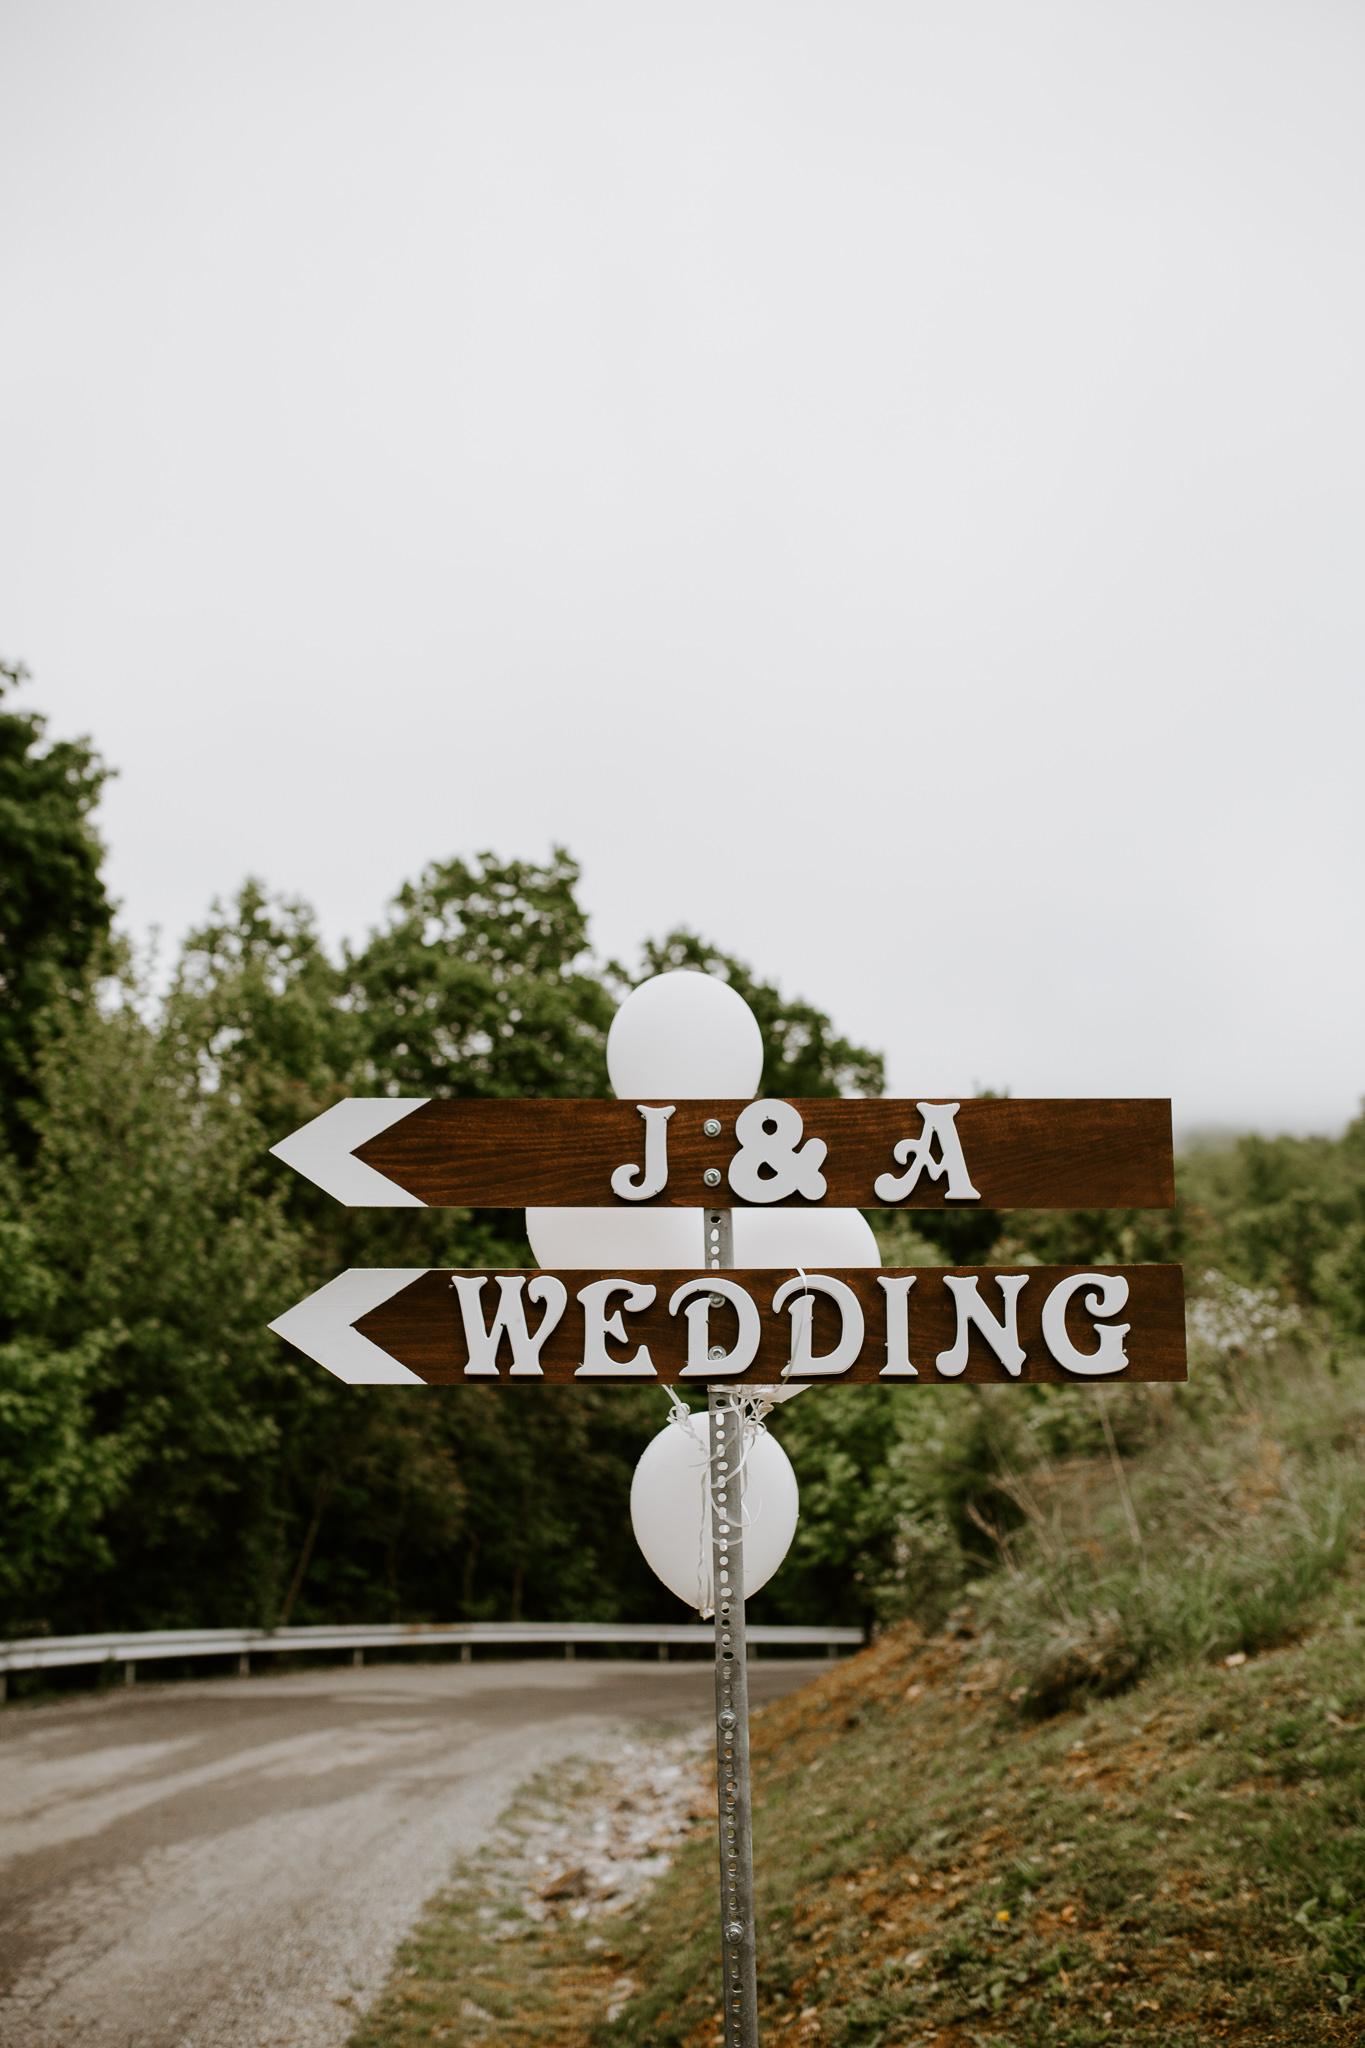 House Mountain Inn - Weddings - Lexington - Virginia - Best Wedding Photographer - Pat Cori Photography-2.jpg